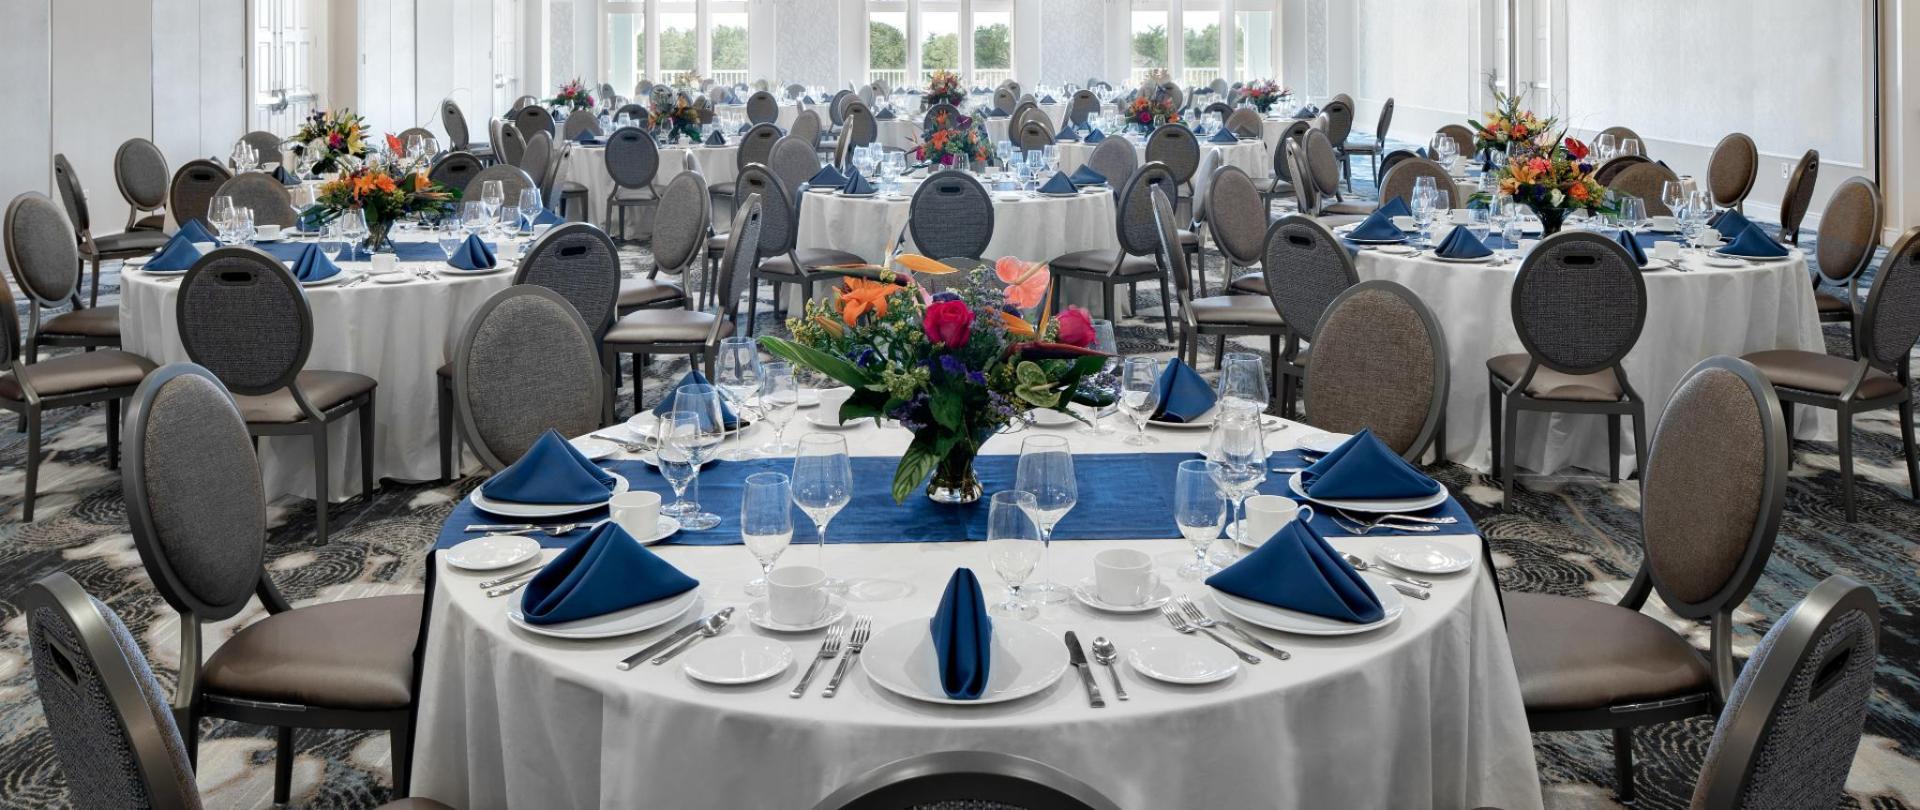 Ascend-Hotels-Beaufort-Hotel-NC-Rachel-Carson-Ballroom-1902x810.jpg